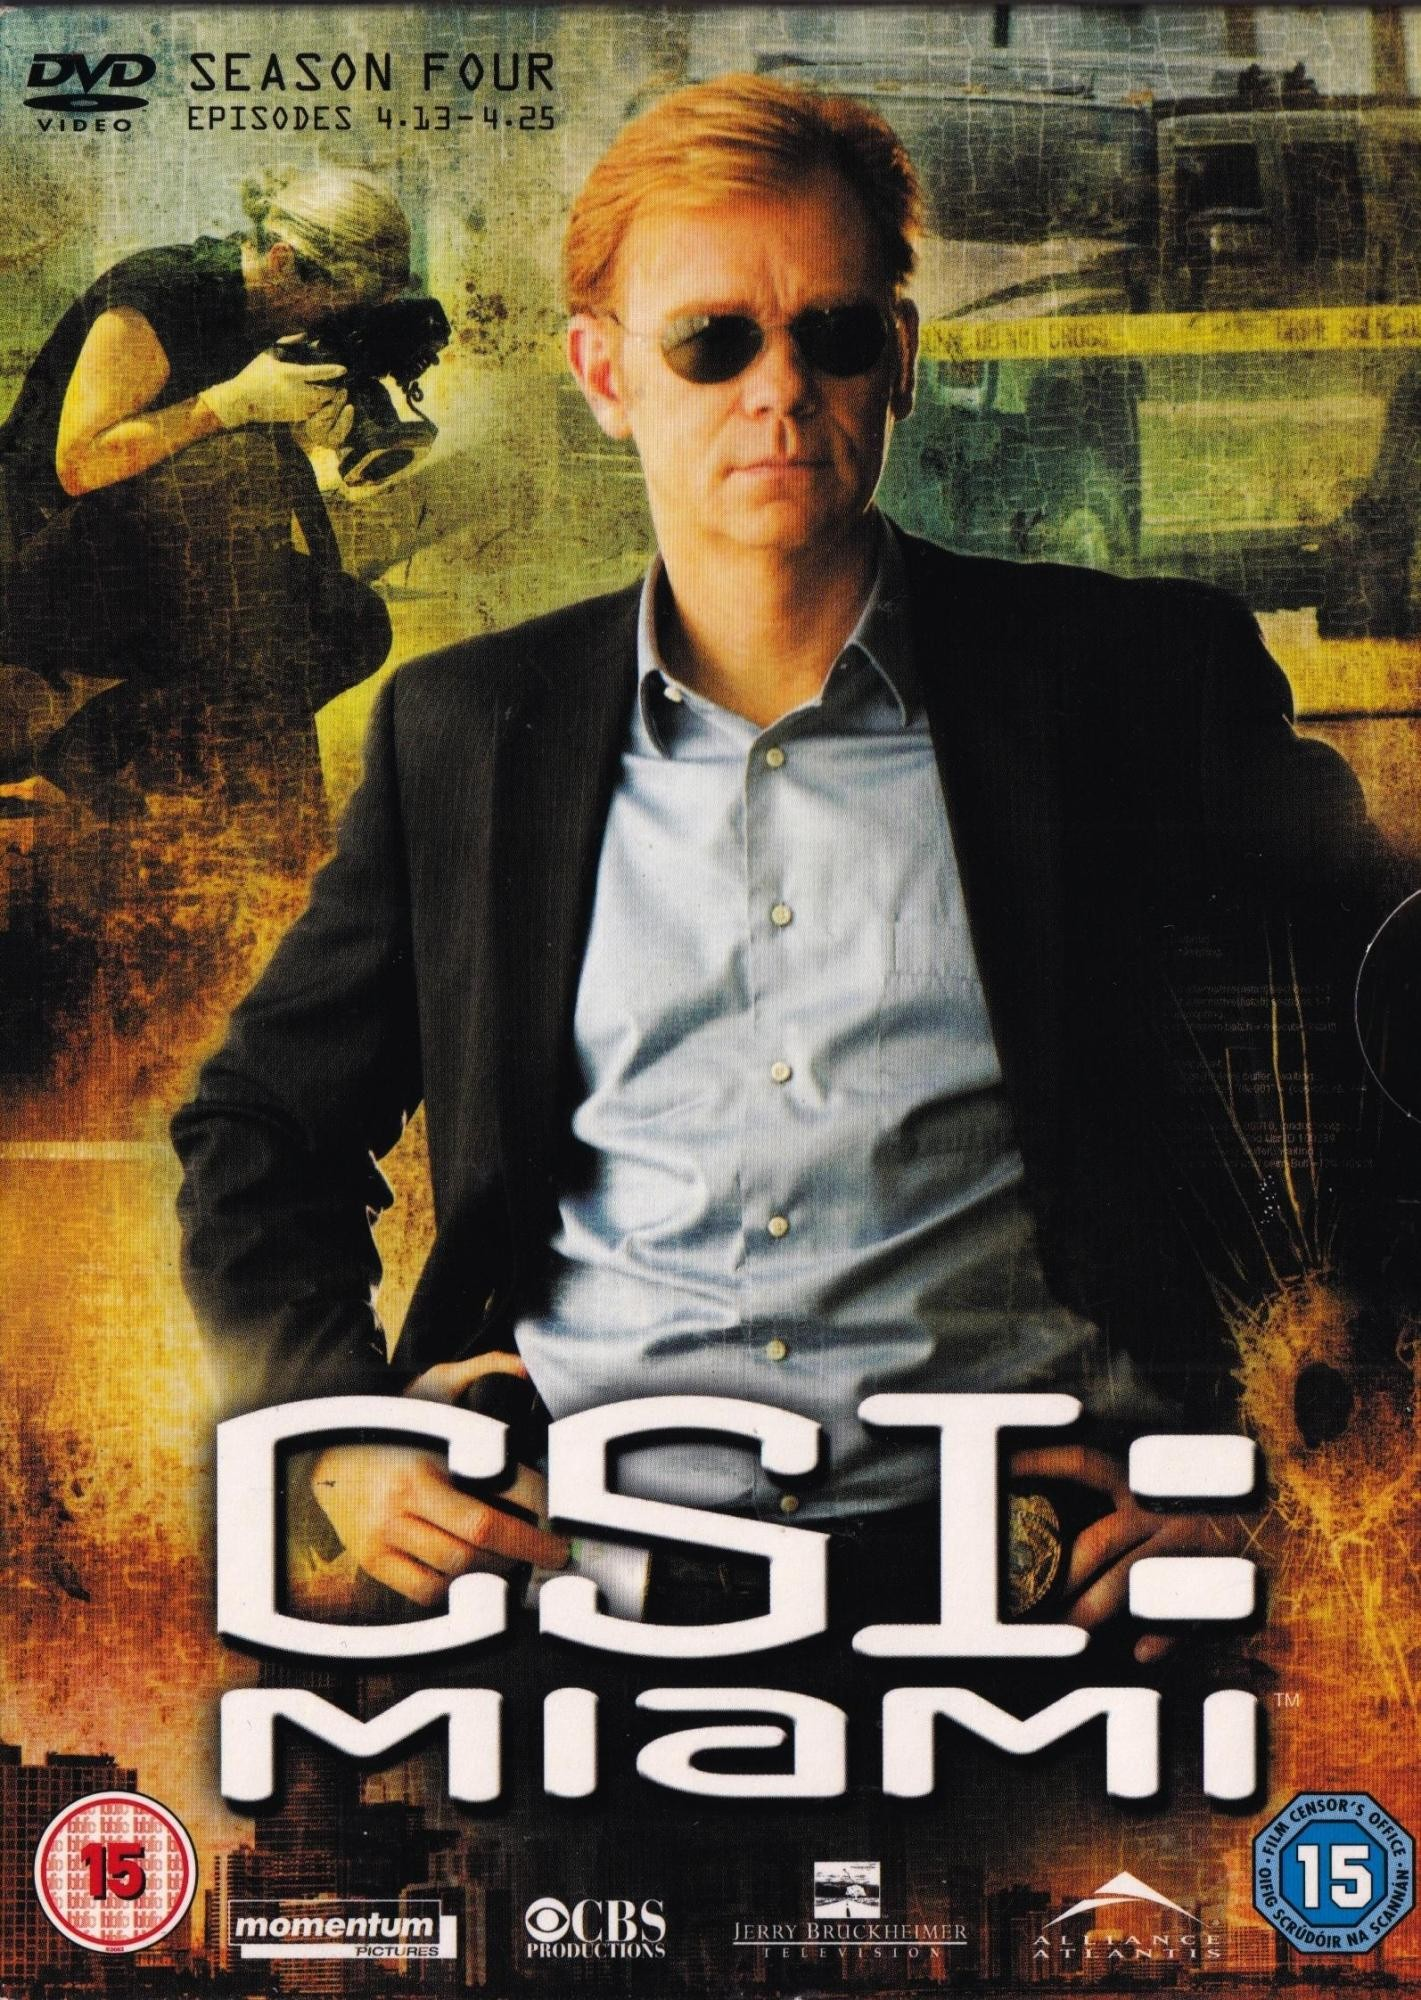 Csi Miami - Season Four Episodes 13-25 - David Caruso